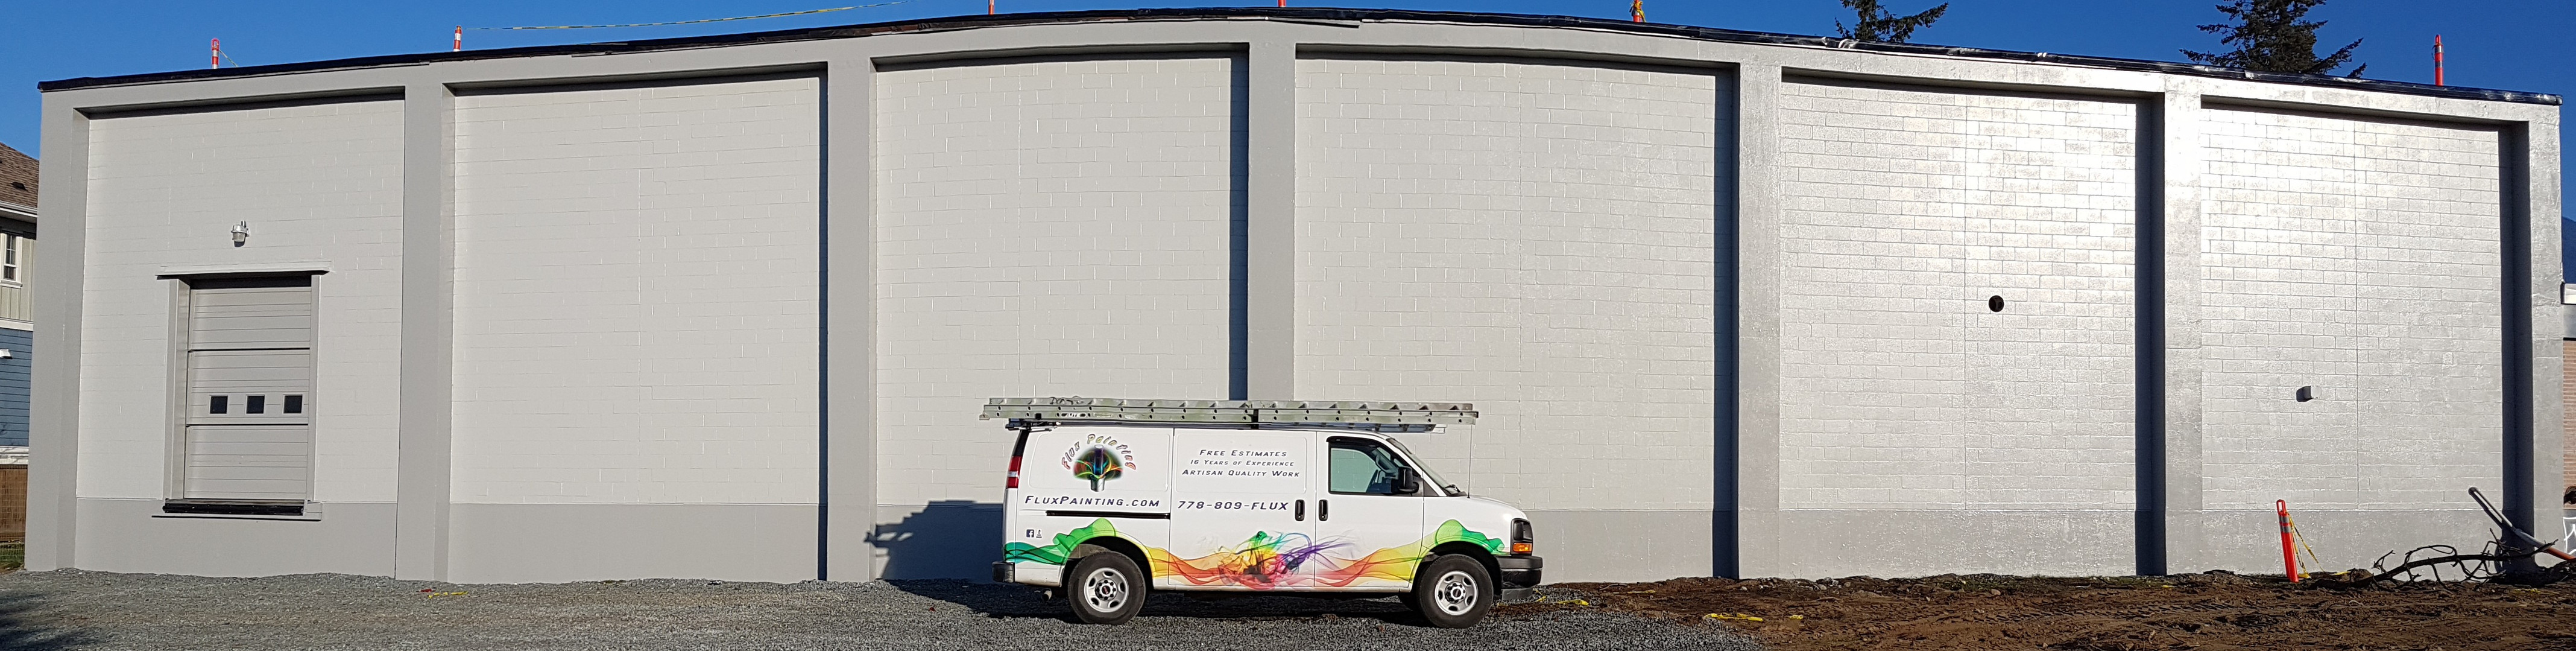 Flux Painting Van